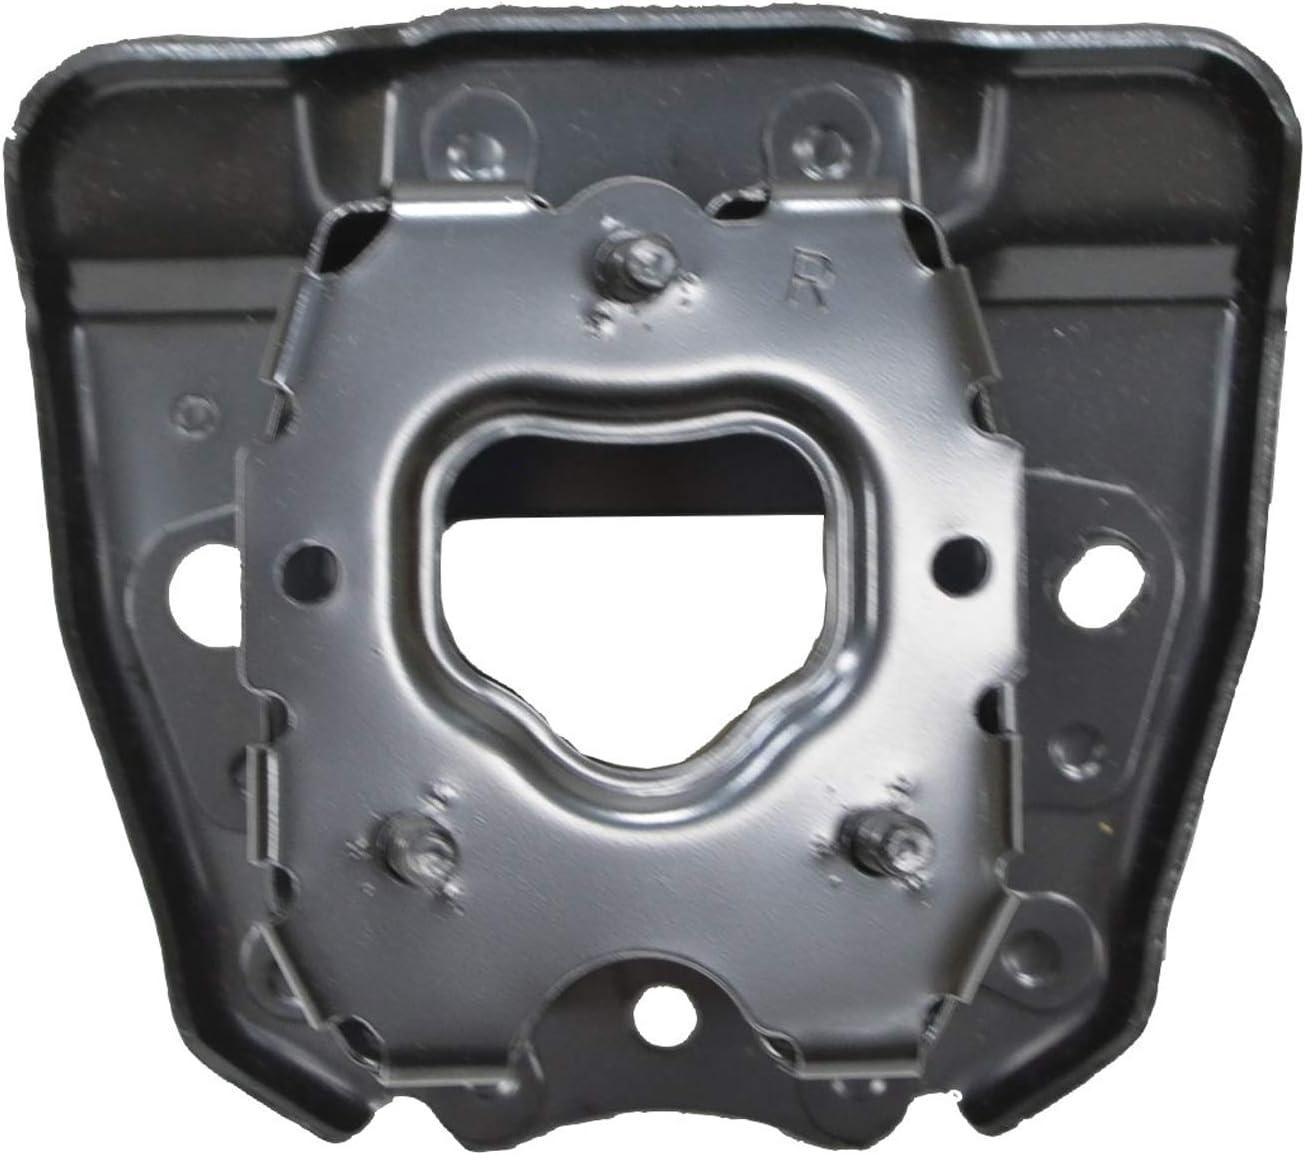 2013-2017 Nissan Altima Rear Passenger Side Bumper Mounting Bracket; Sedan; Made Of Steel Partslink NI1167112